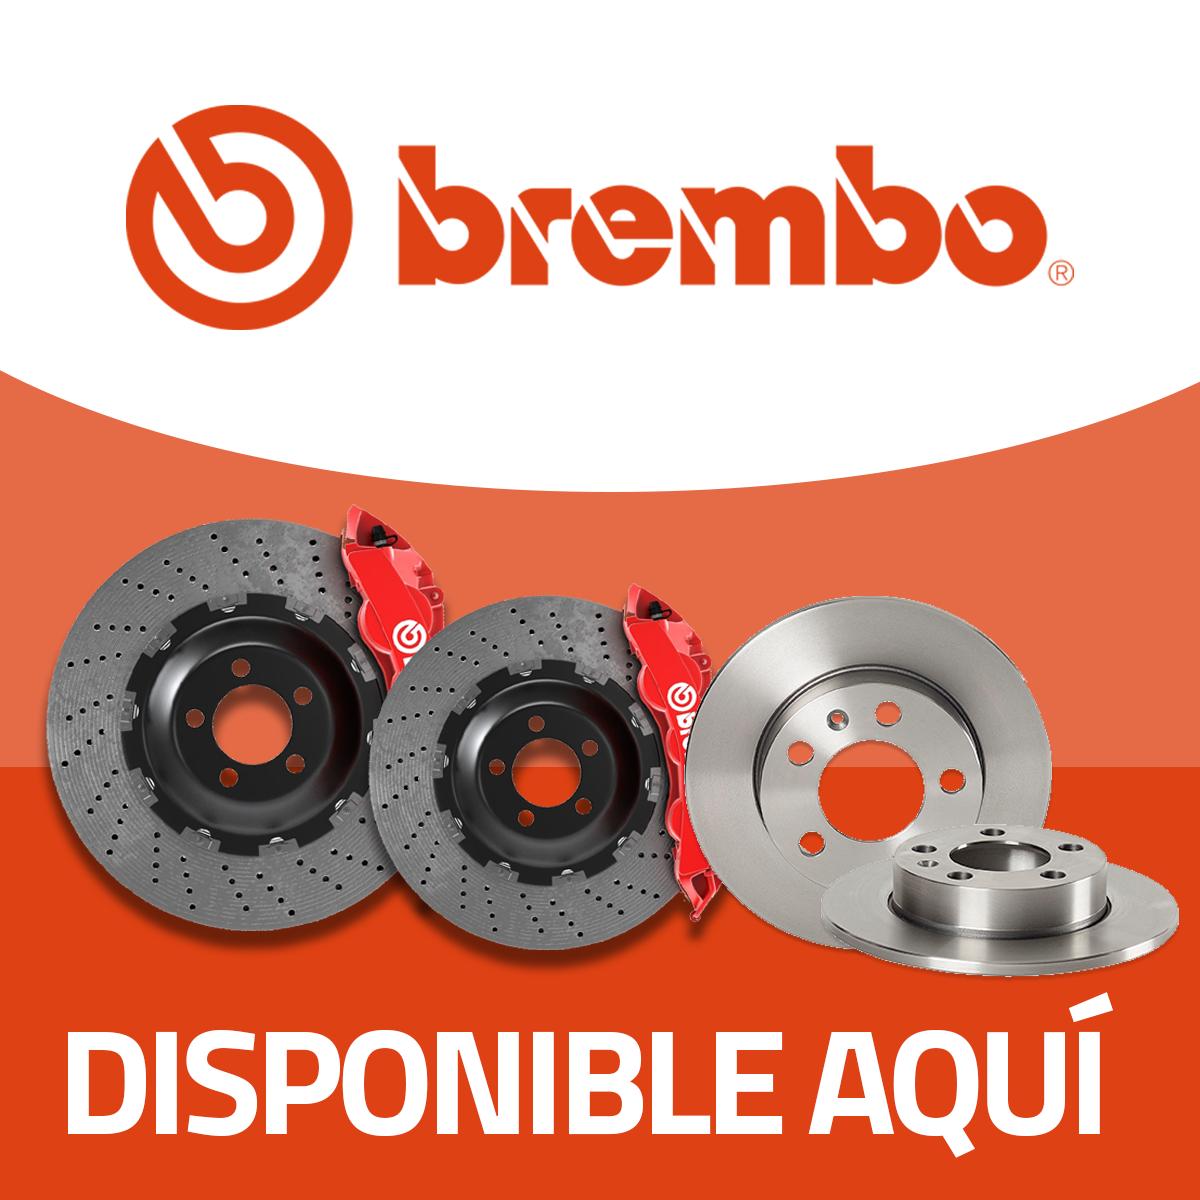 brembo DISPONIBLE